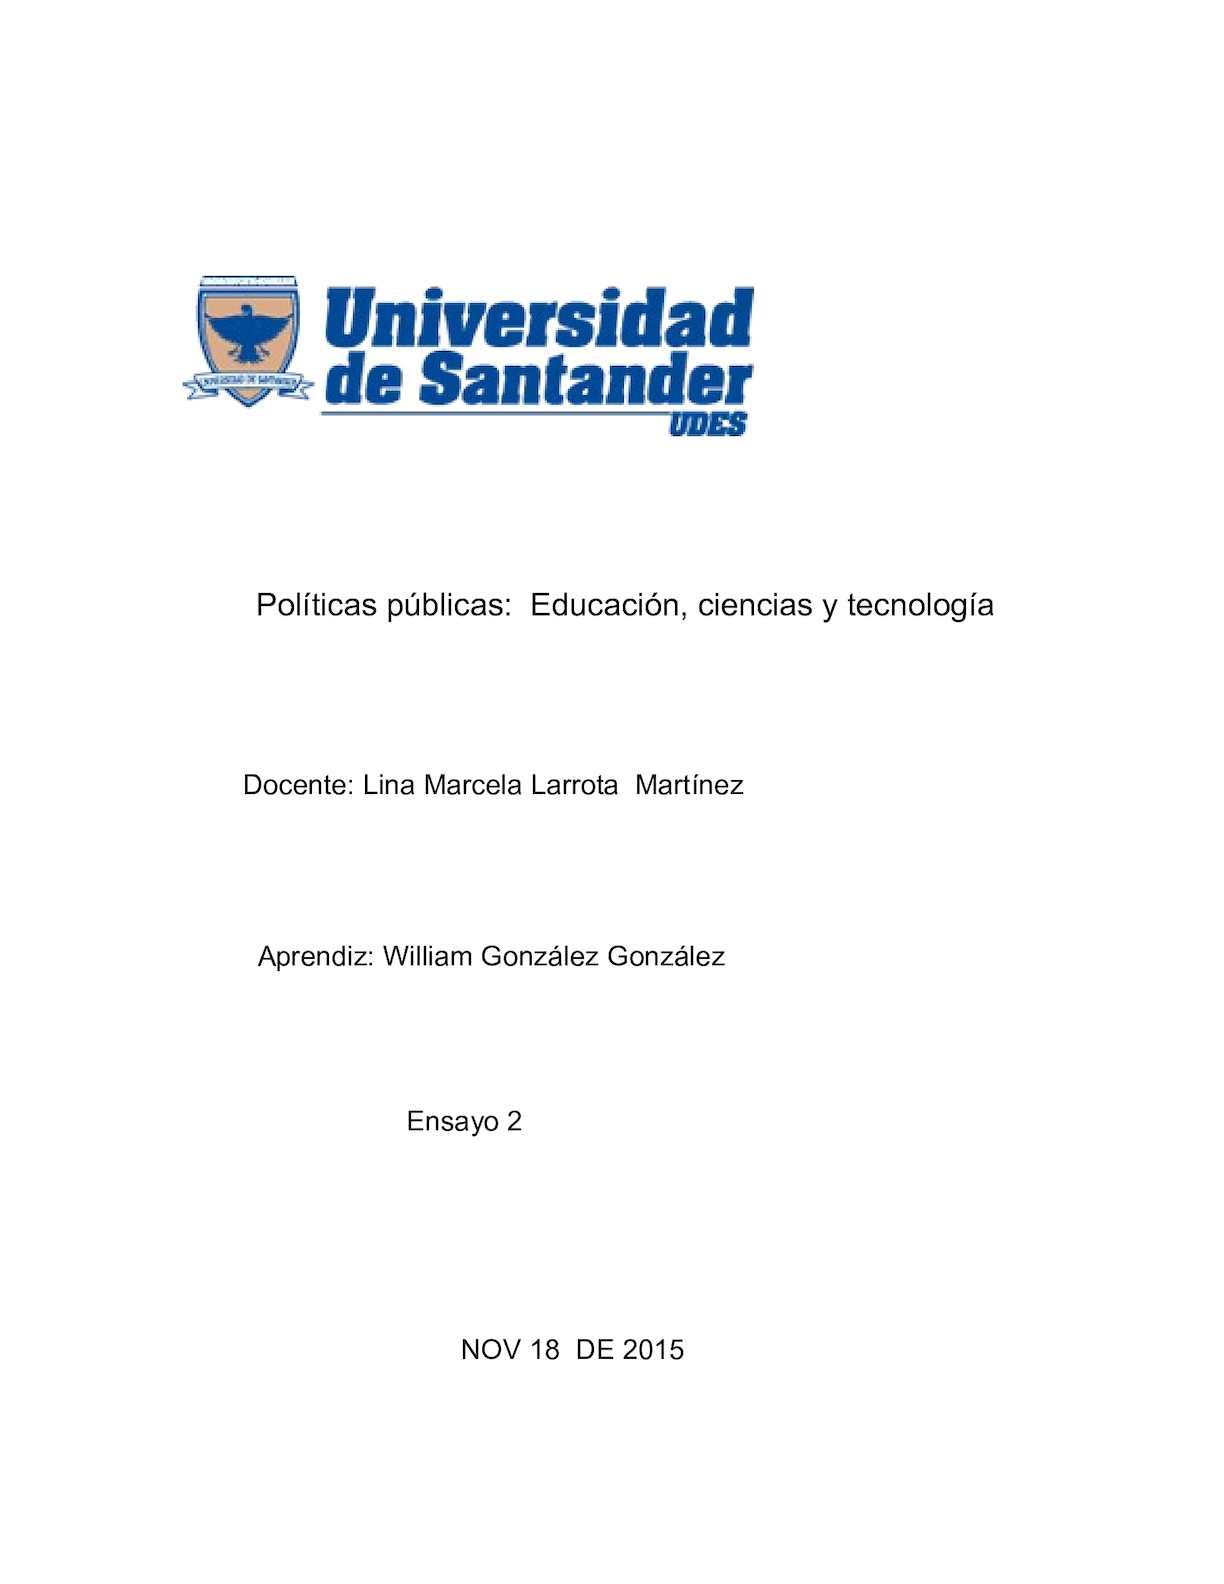 William Gonzalez Gonzalez Ensayo Actividad2 2 Doc